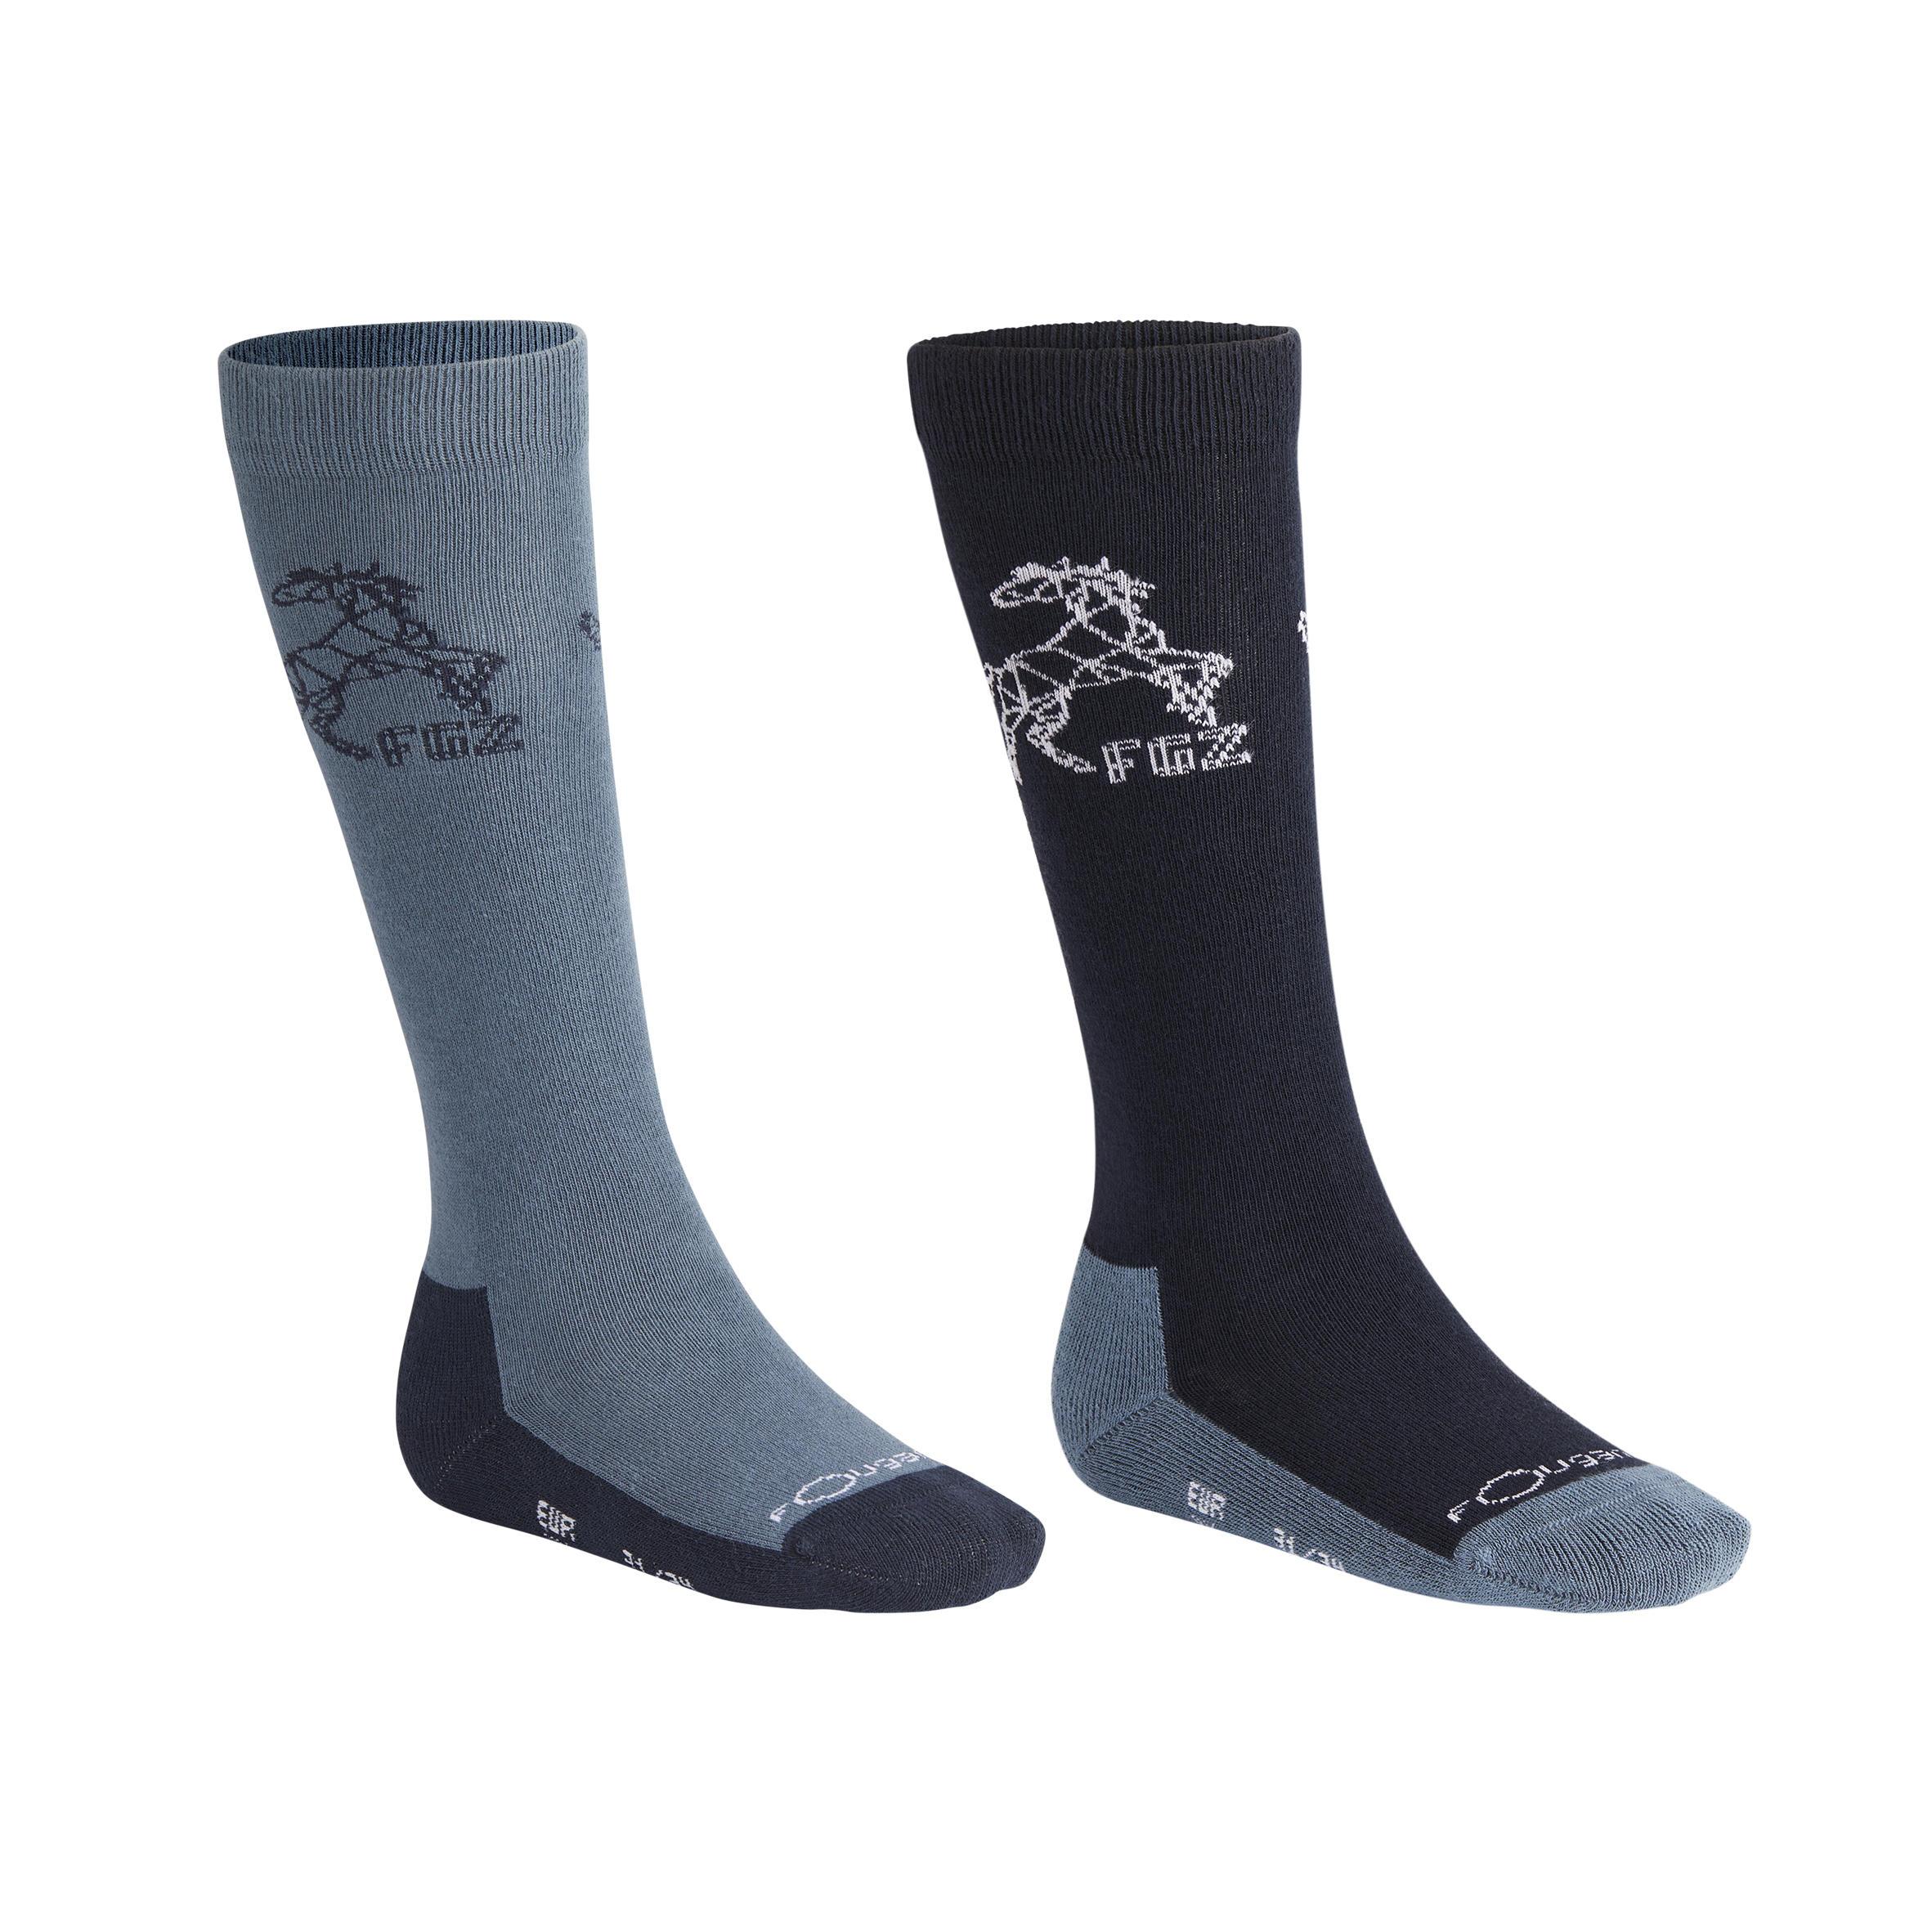 500 Boy Children's Horse Riding Socks 2-Pair - Navy/Grey